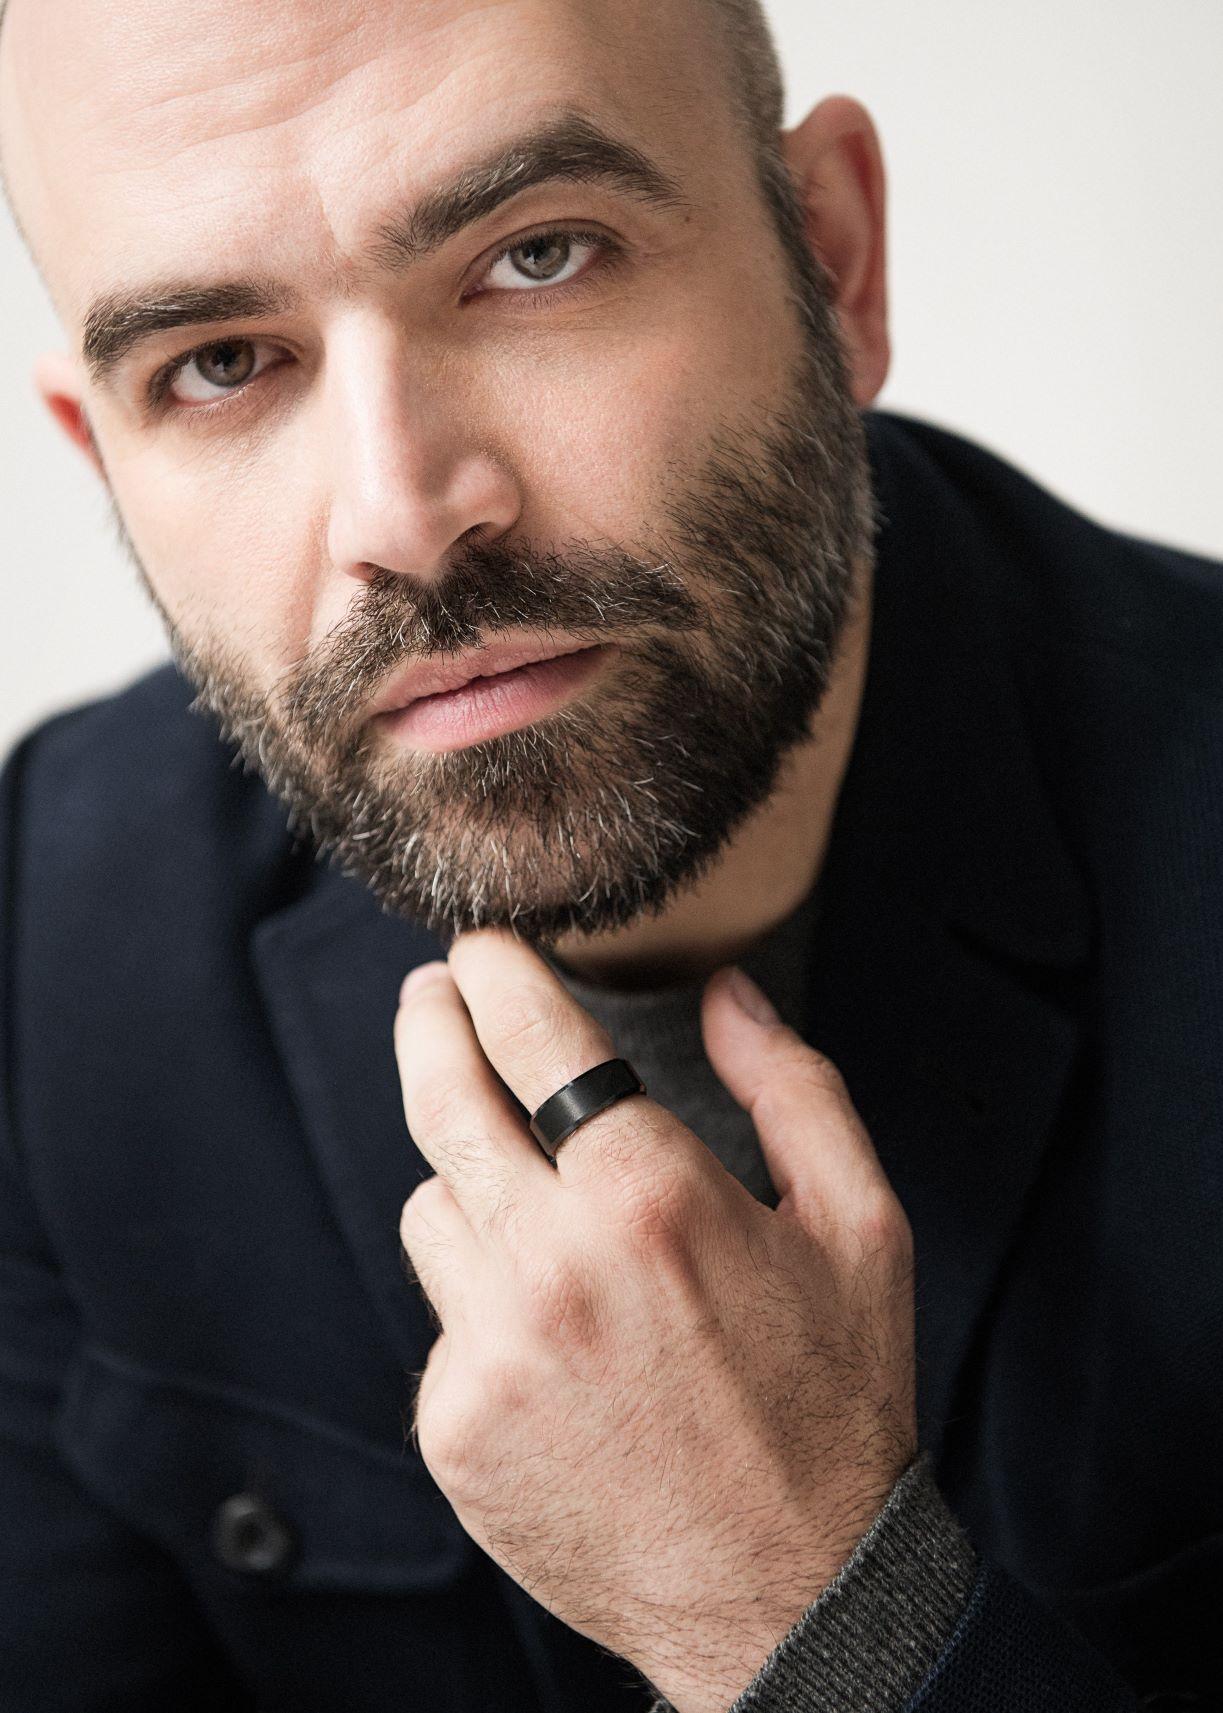 Teatro Carcano Milano: Roberto Saviano SONO ANCORA VIVO